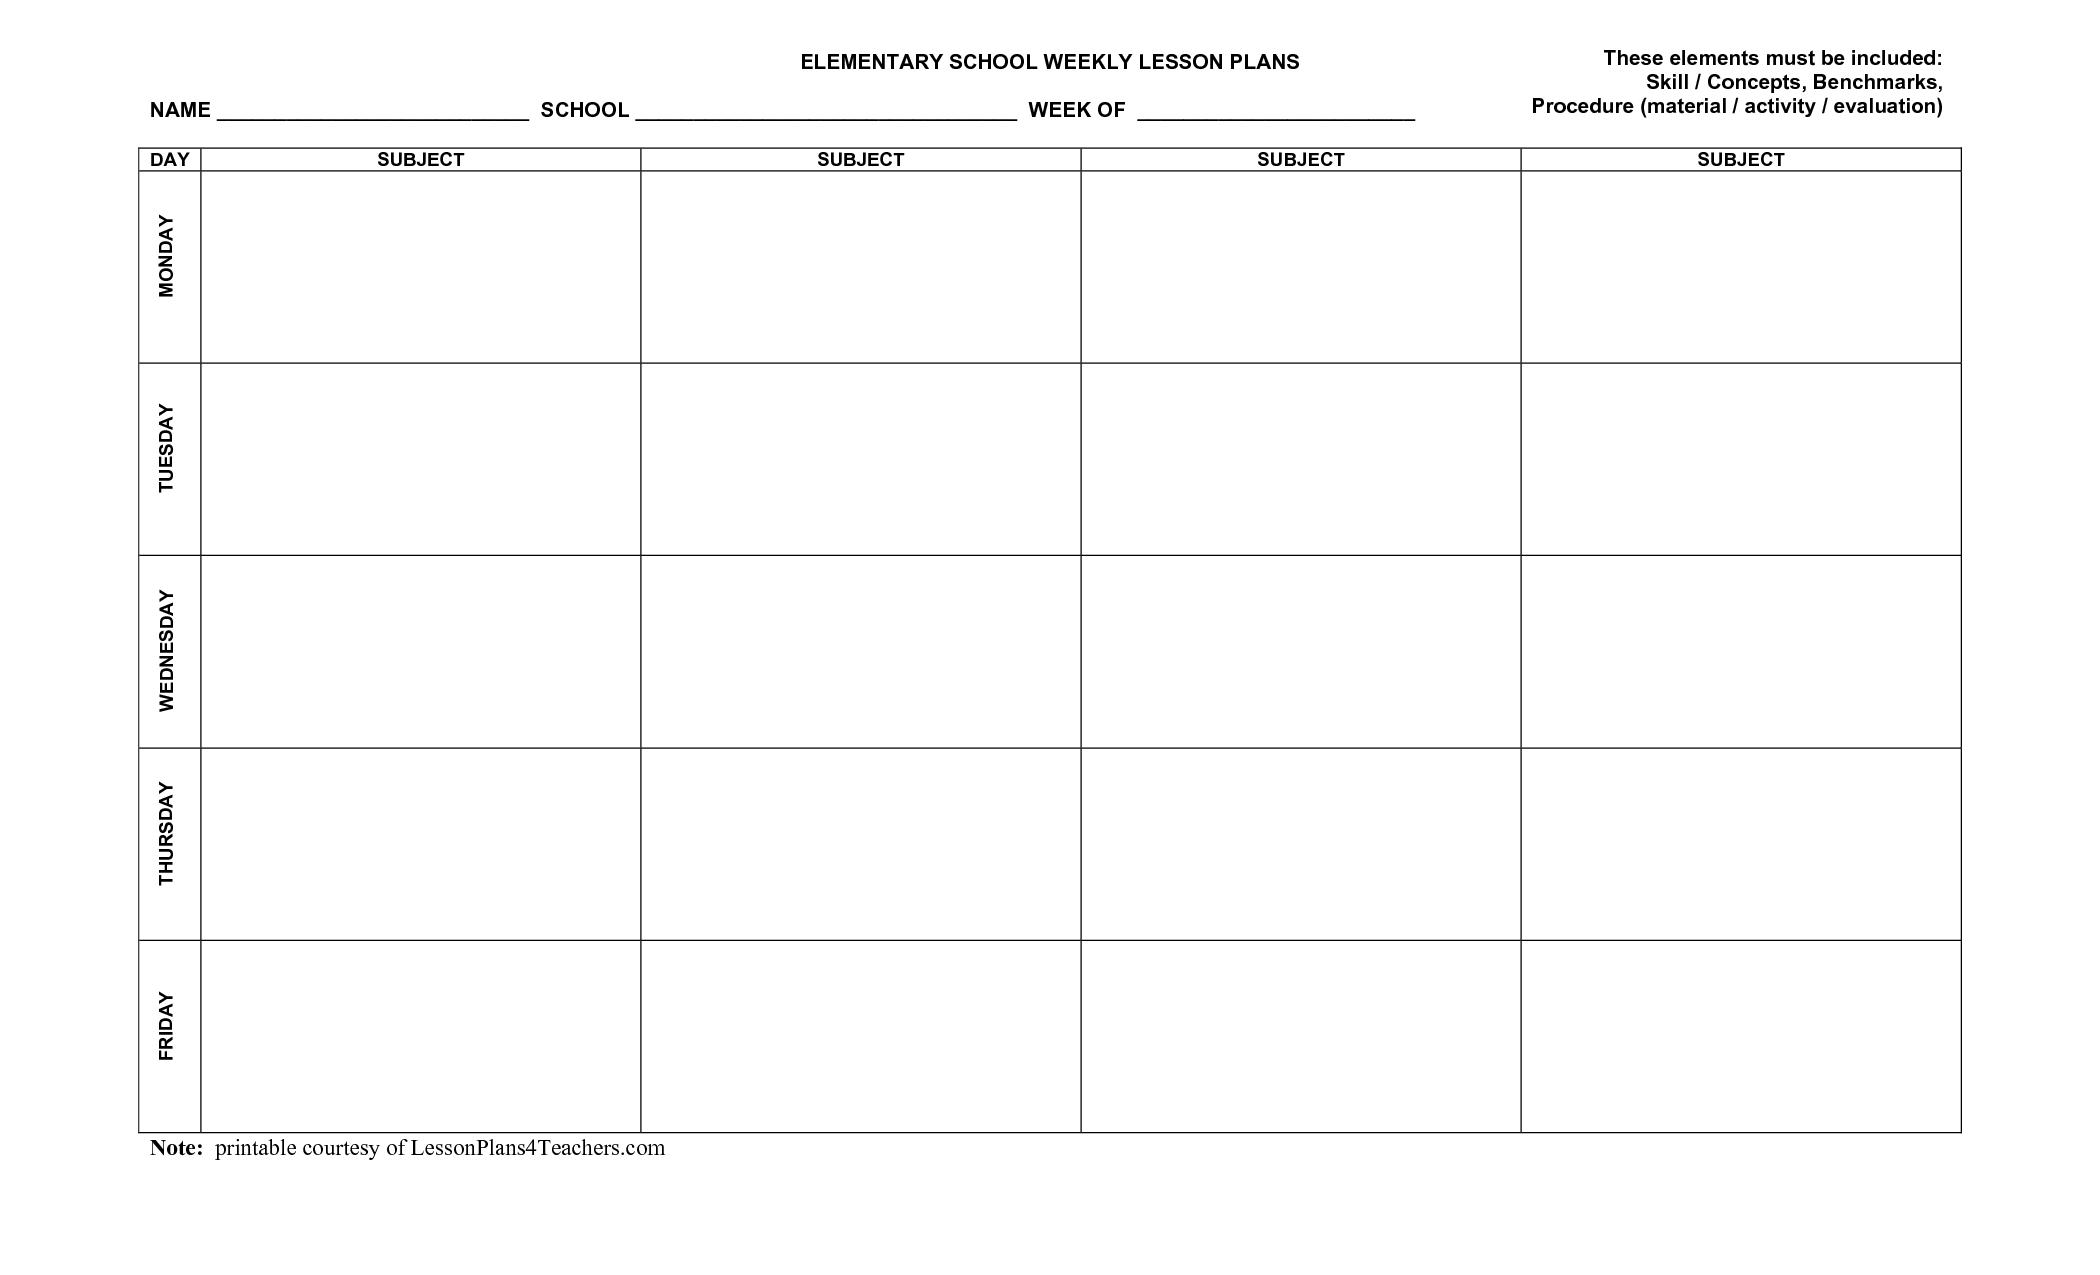 Blank Weekly Lesson Plan Templates Mqfotfas